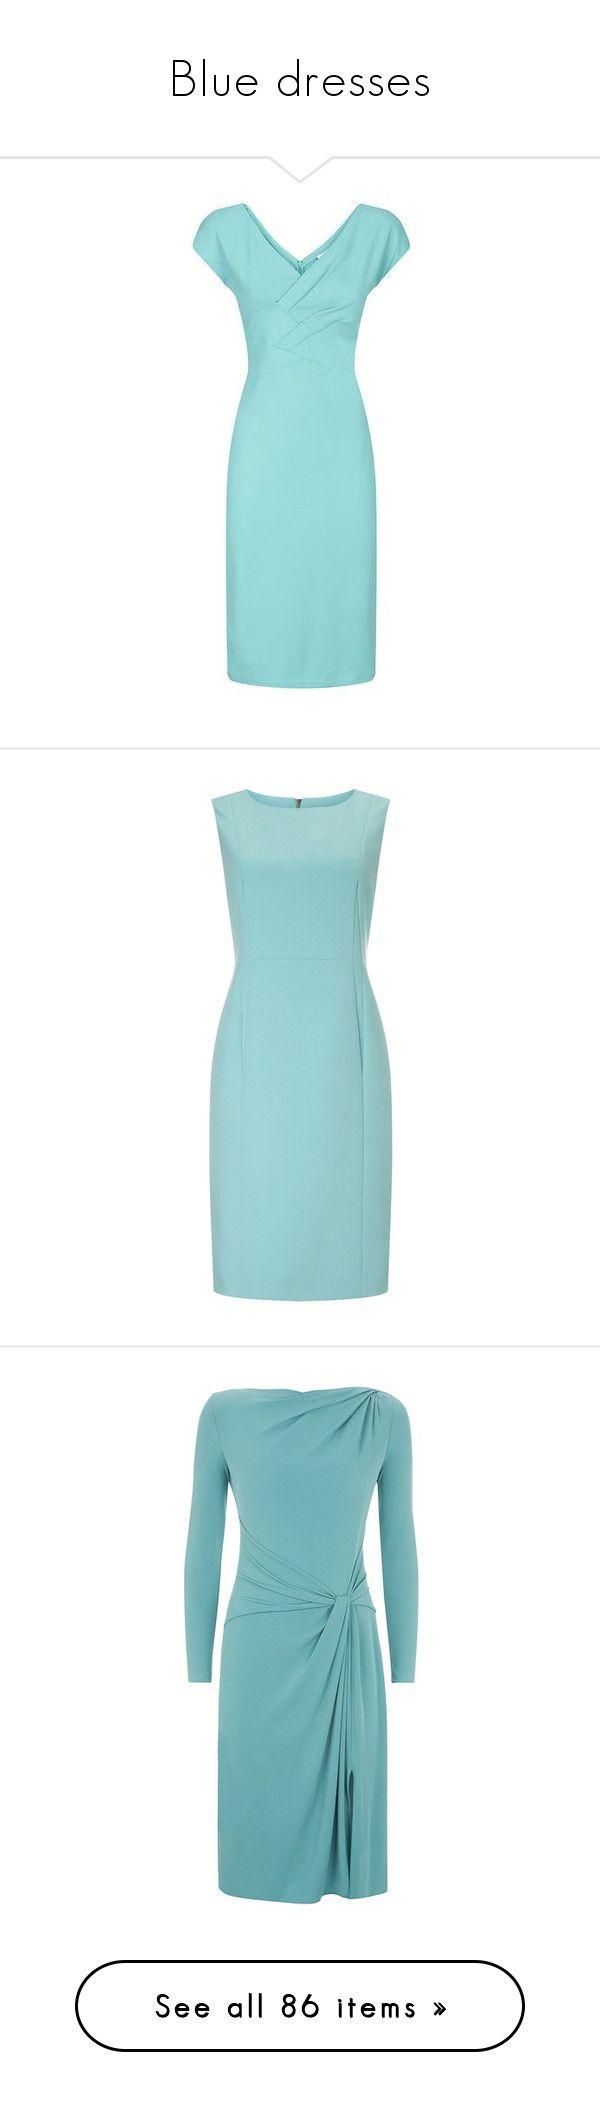 """Blue dresses"" by lorika-borika on Polyvore featuring dresses, green jersey dress, giorgio armani dresses, blue draped dress, blue dress, draped jersey dress, petite, long-sleeve shift dresses, blue midi dress и midi dress"